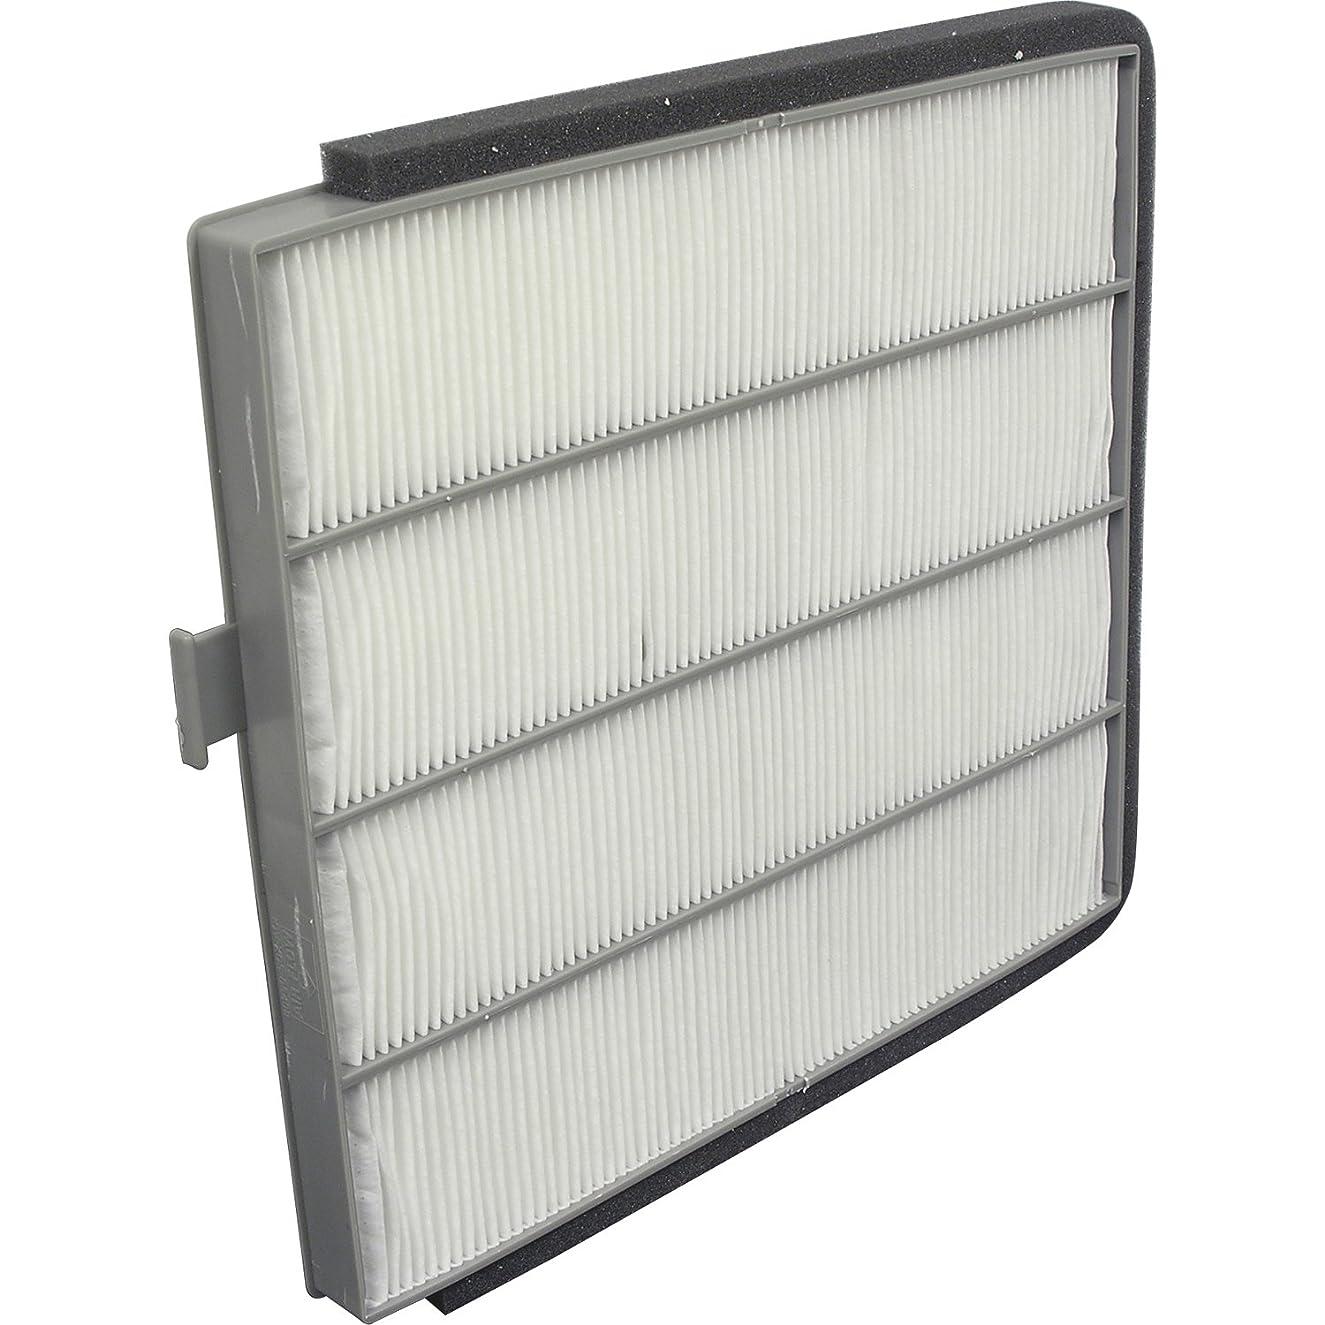 UAC FI 1026C Cabin Air Filter